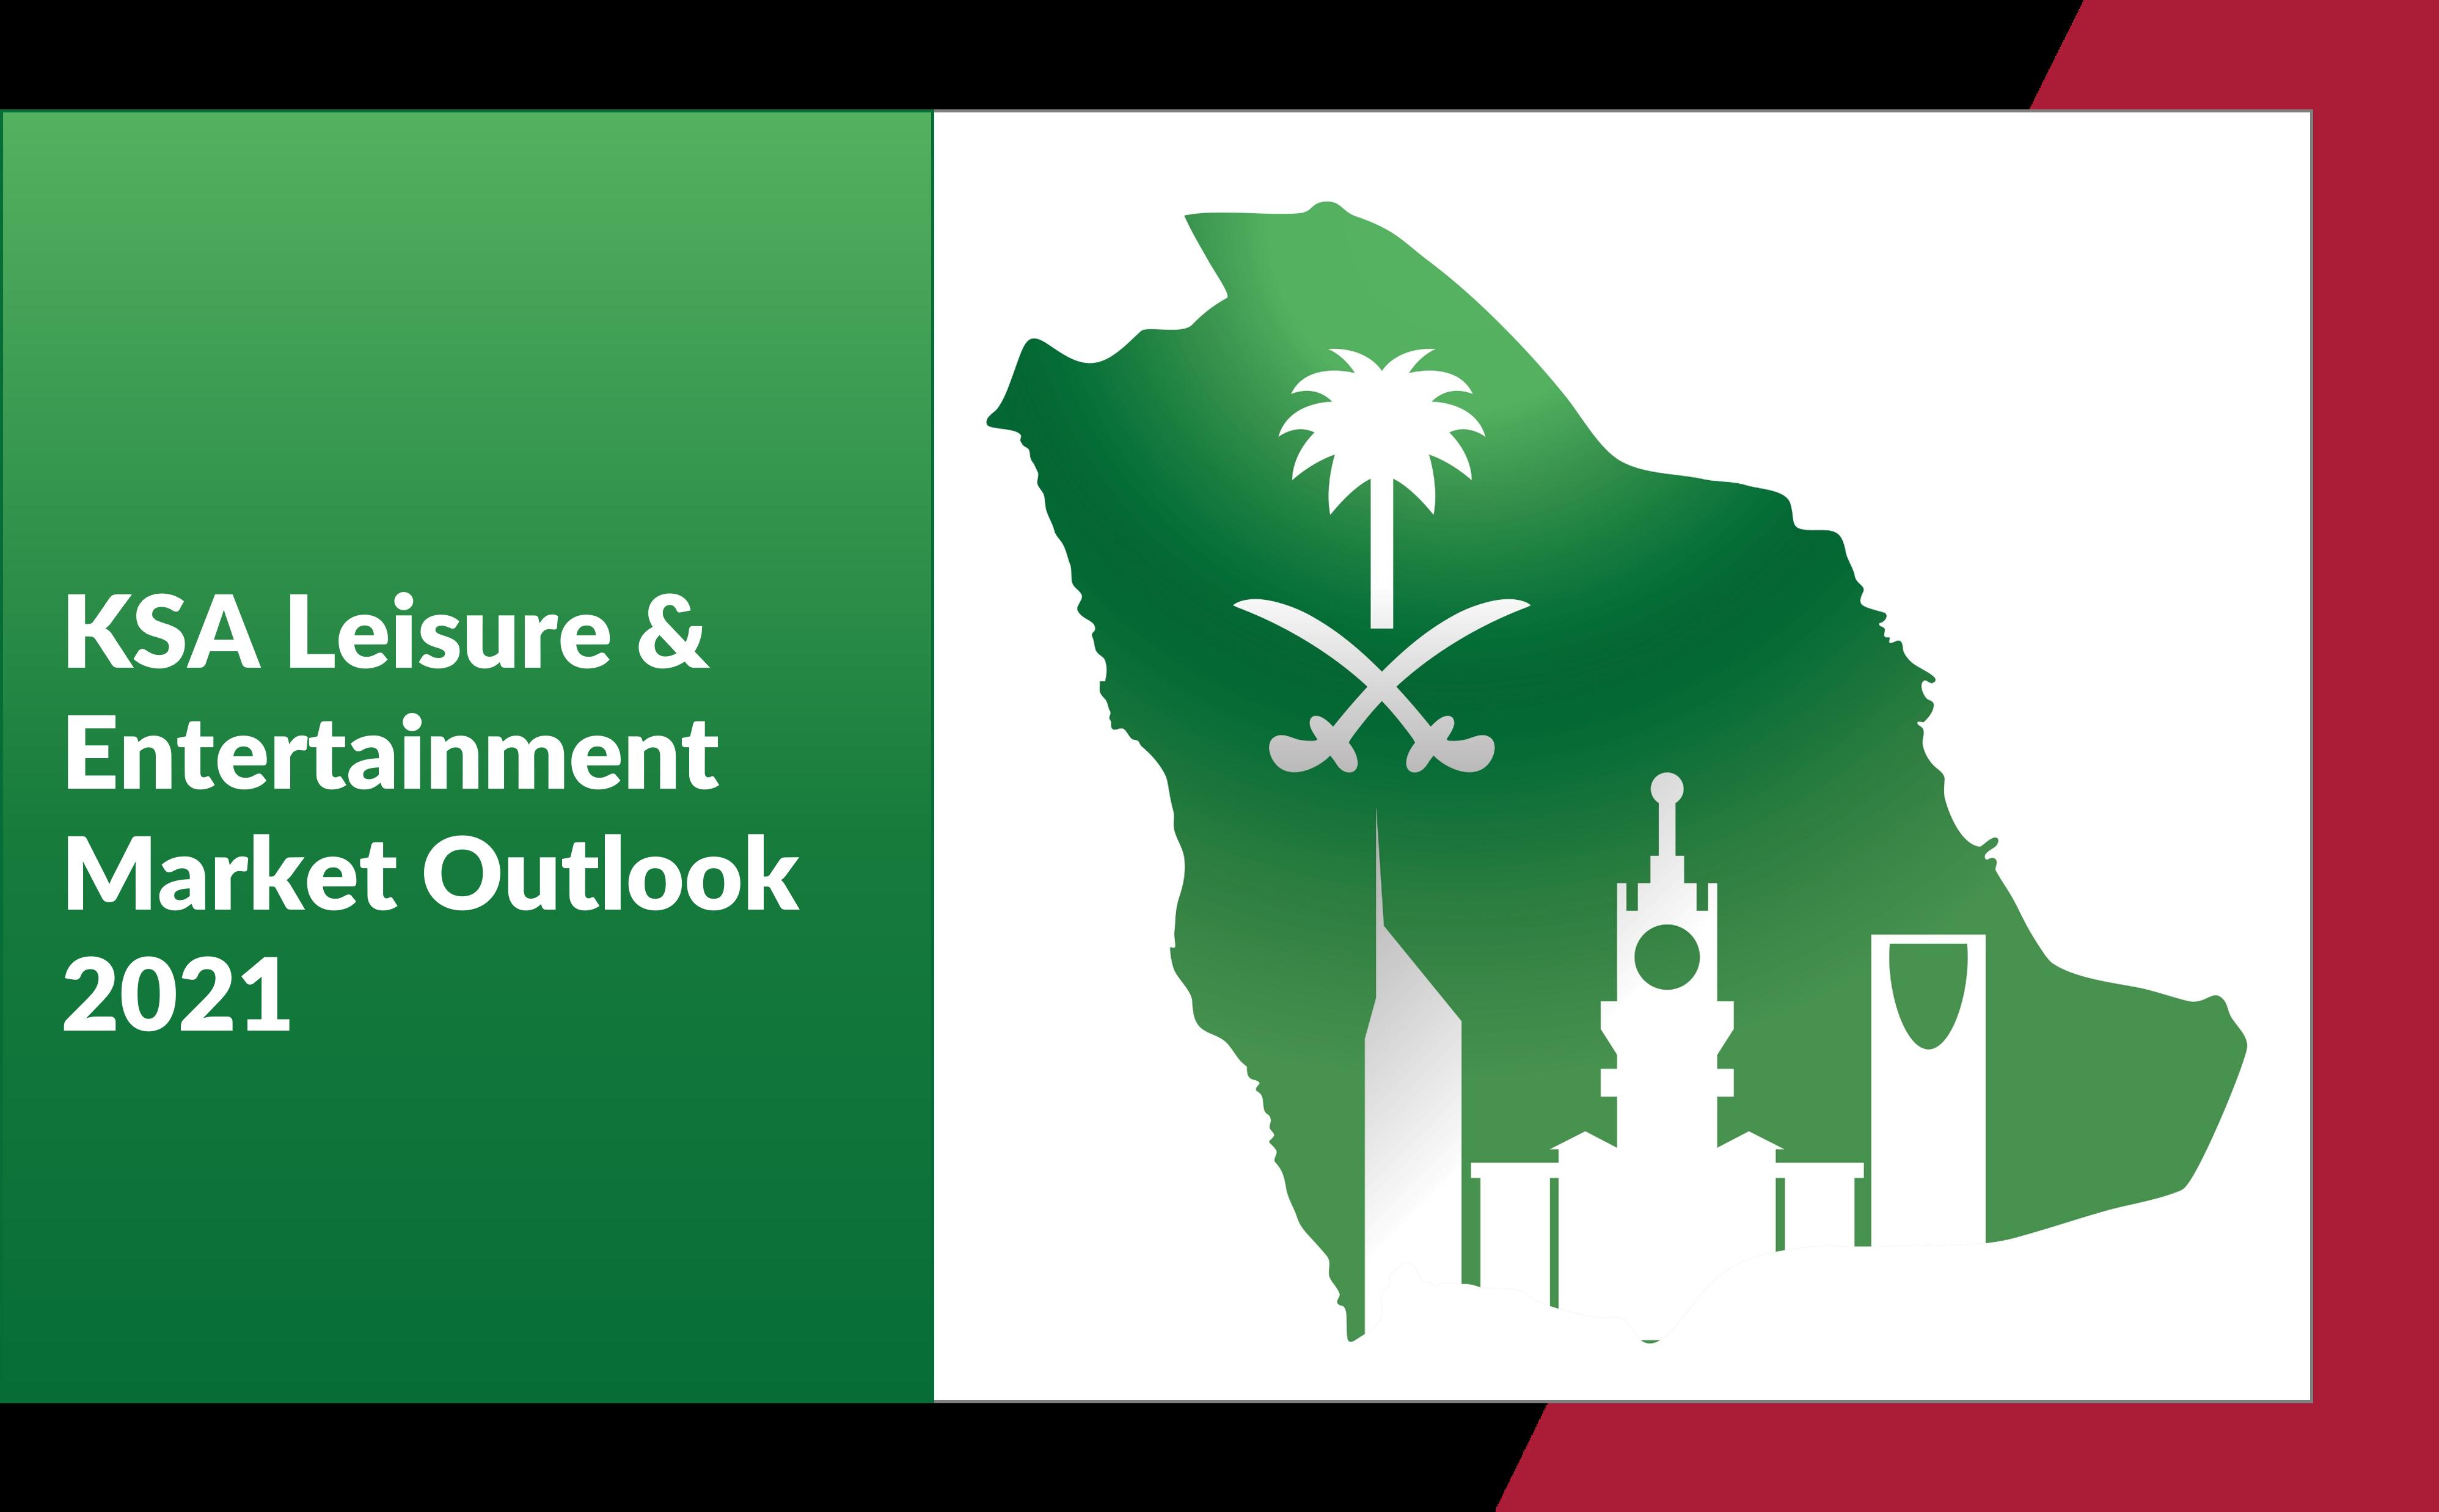 KSA Leisure & Entertainment Market Outlook - banner